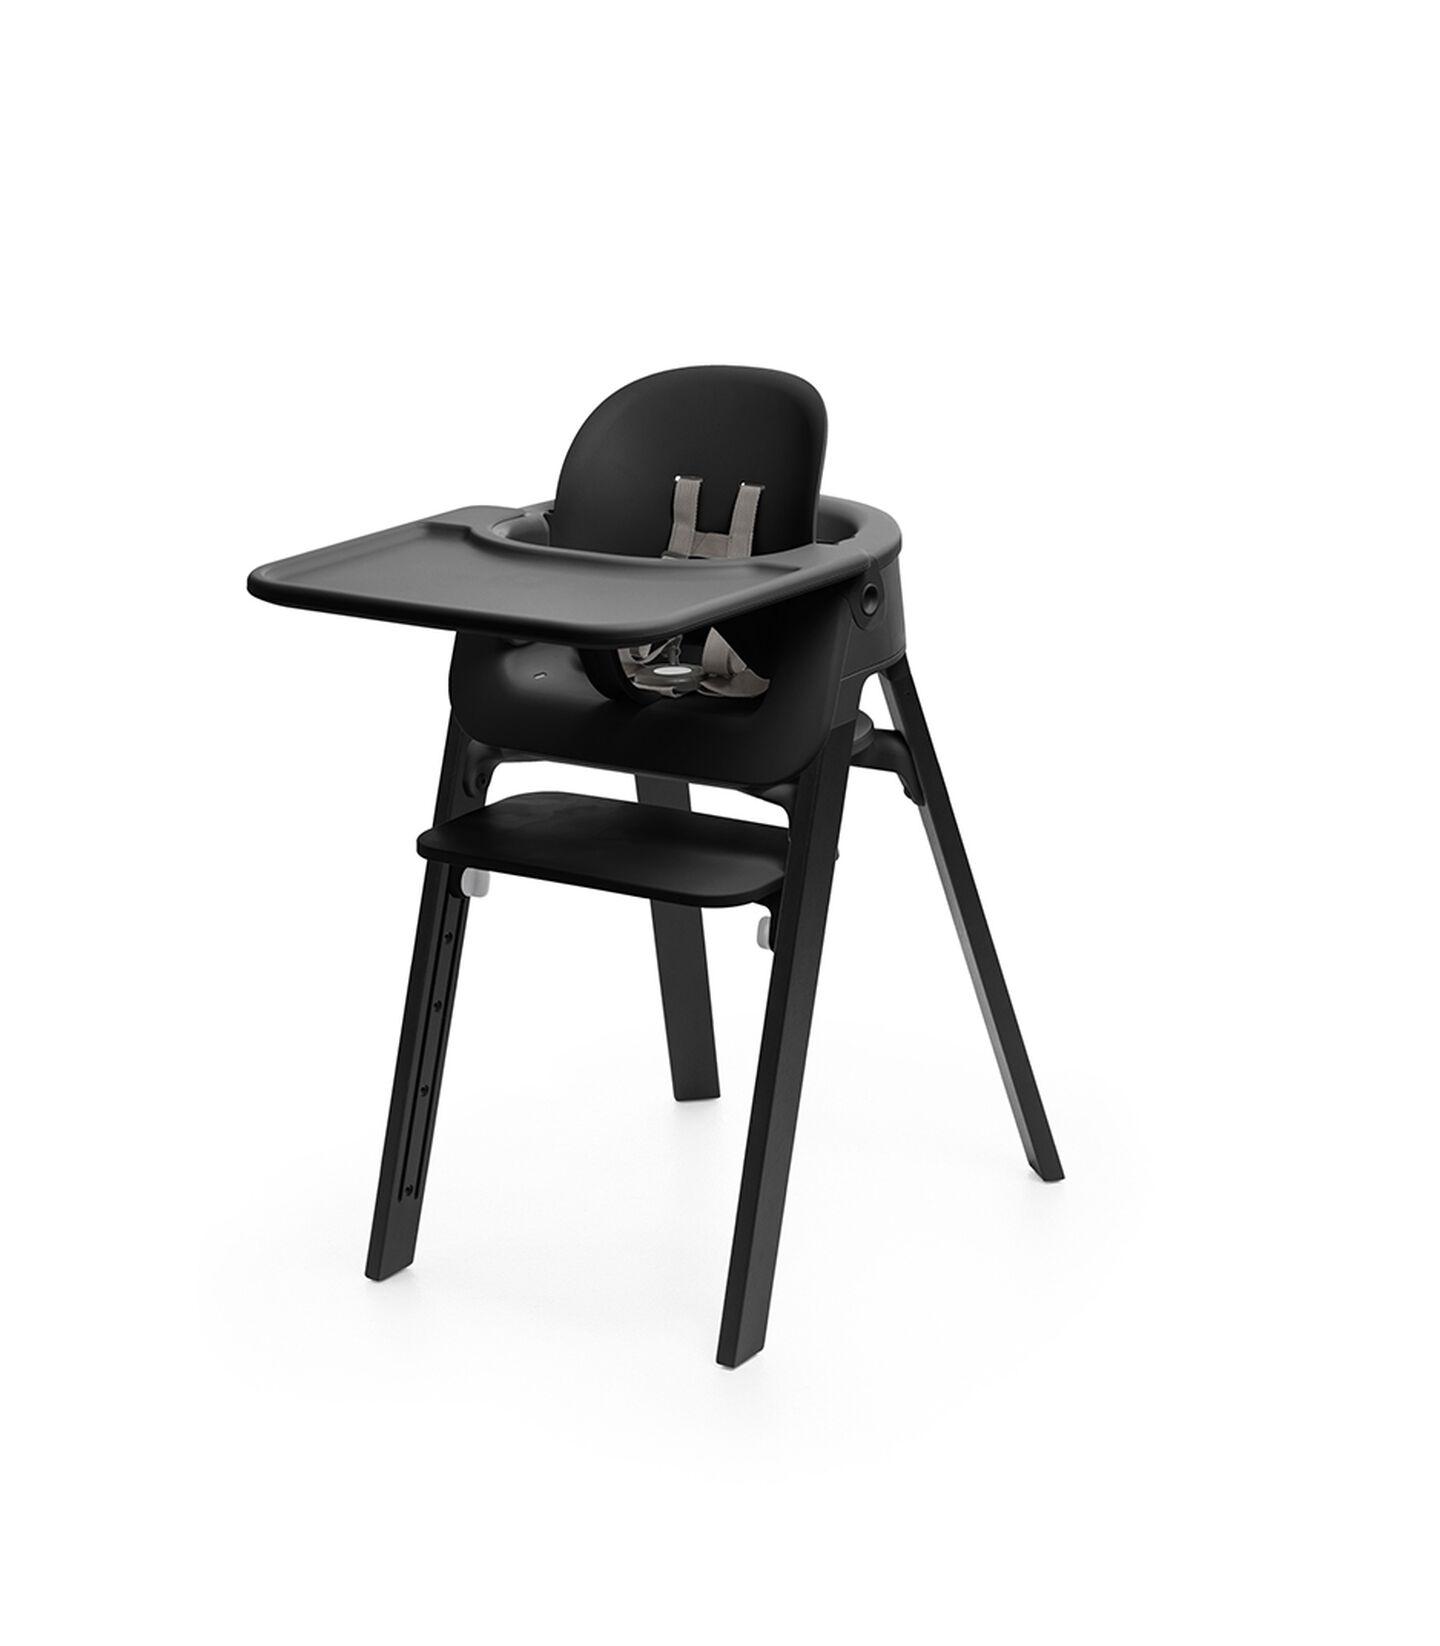 Stokke® Steps™ Baby Set in de kleur Black, Black, mainview view 3